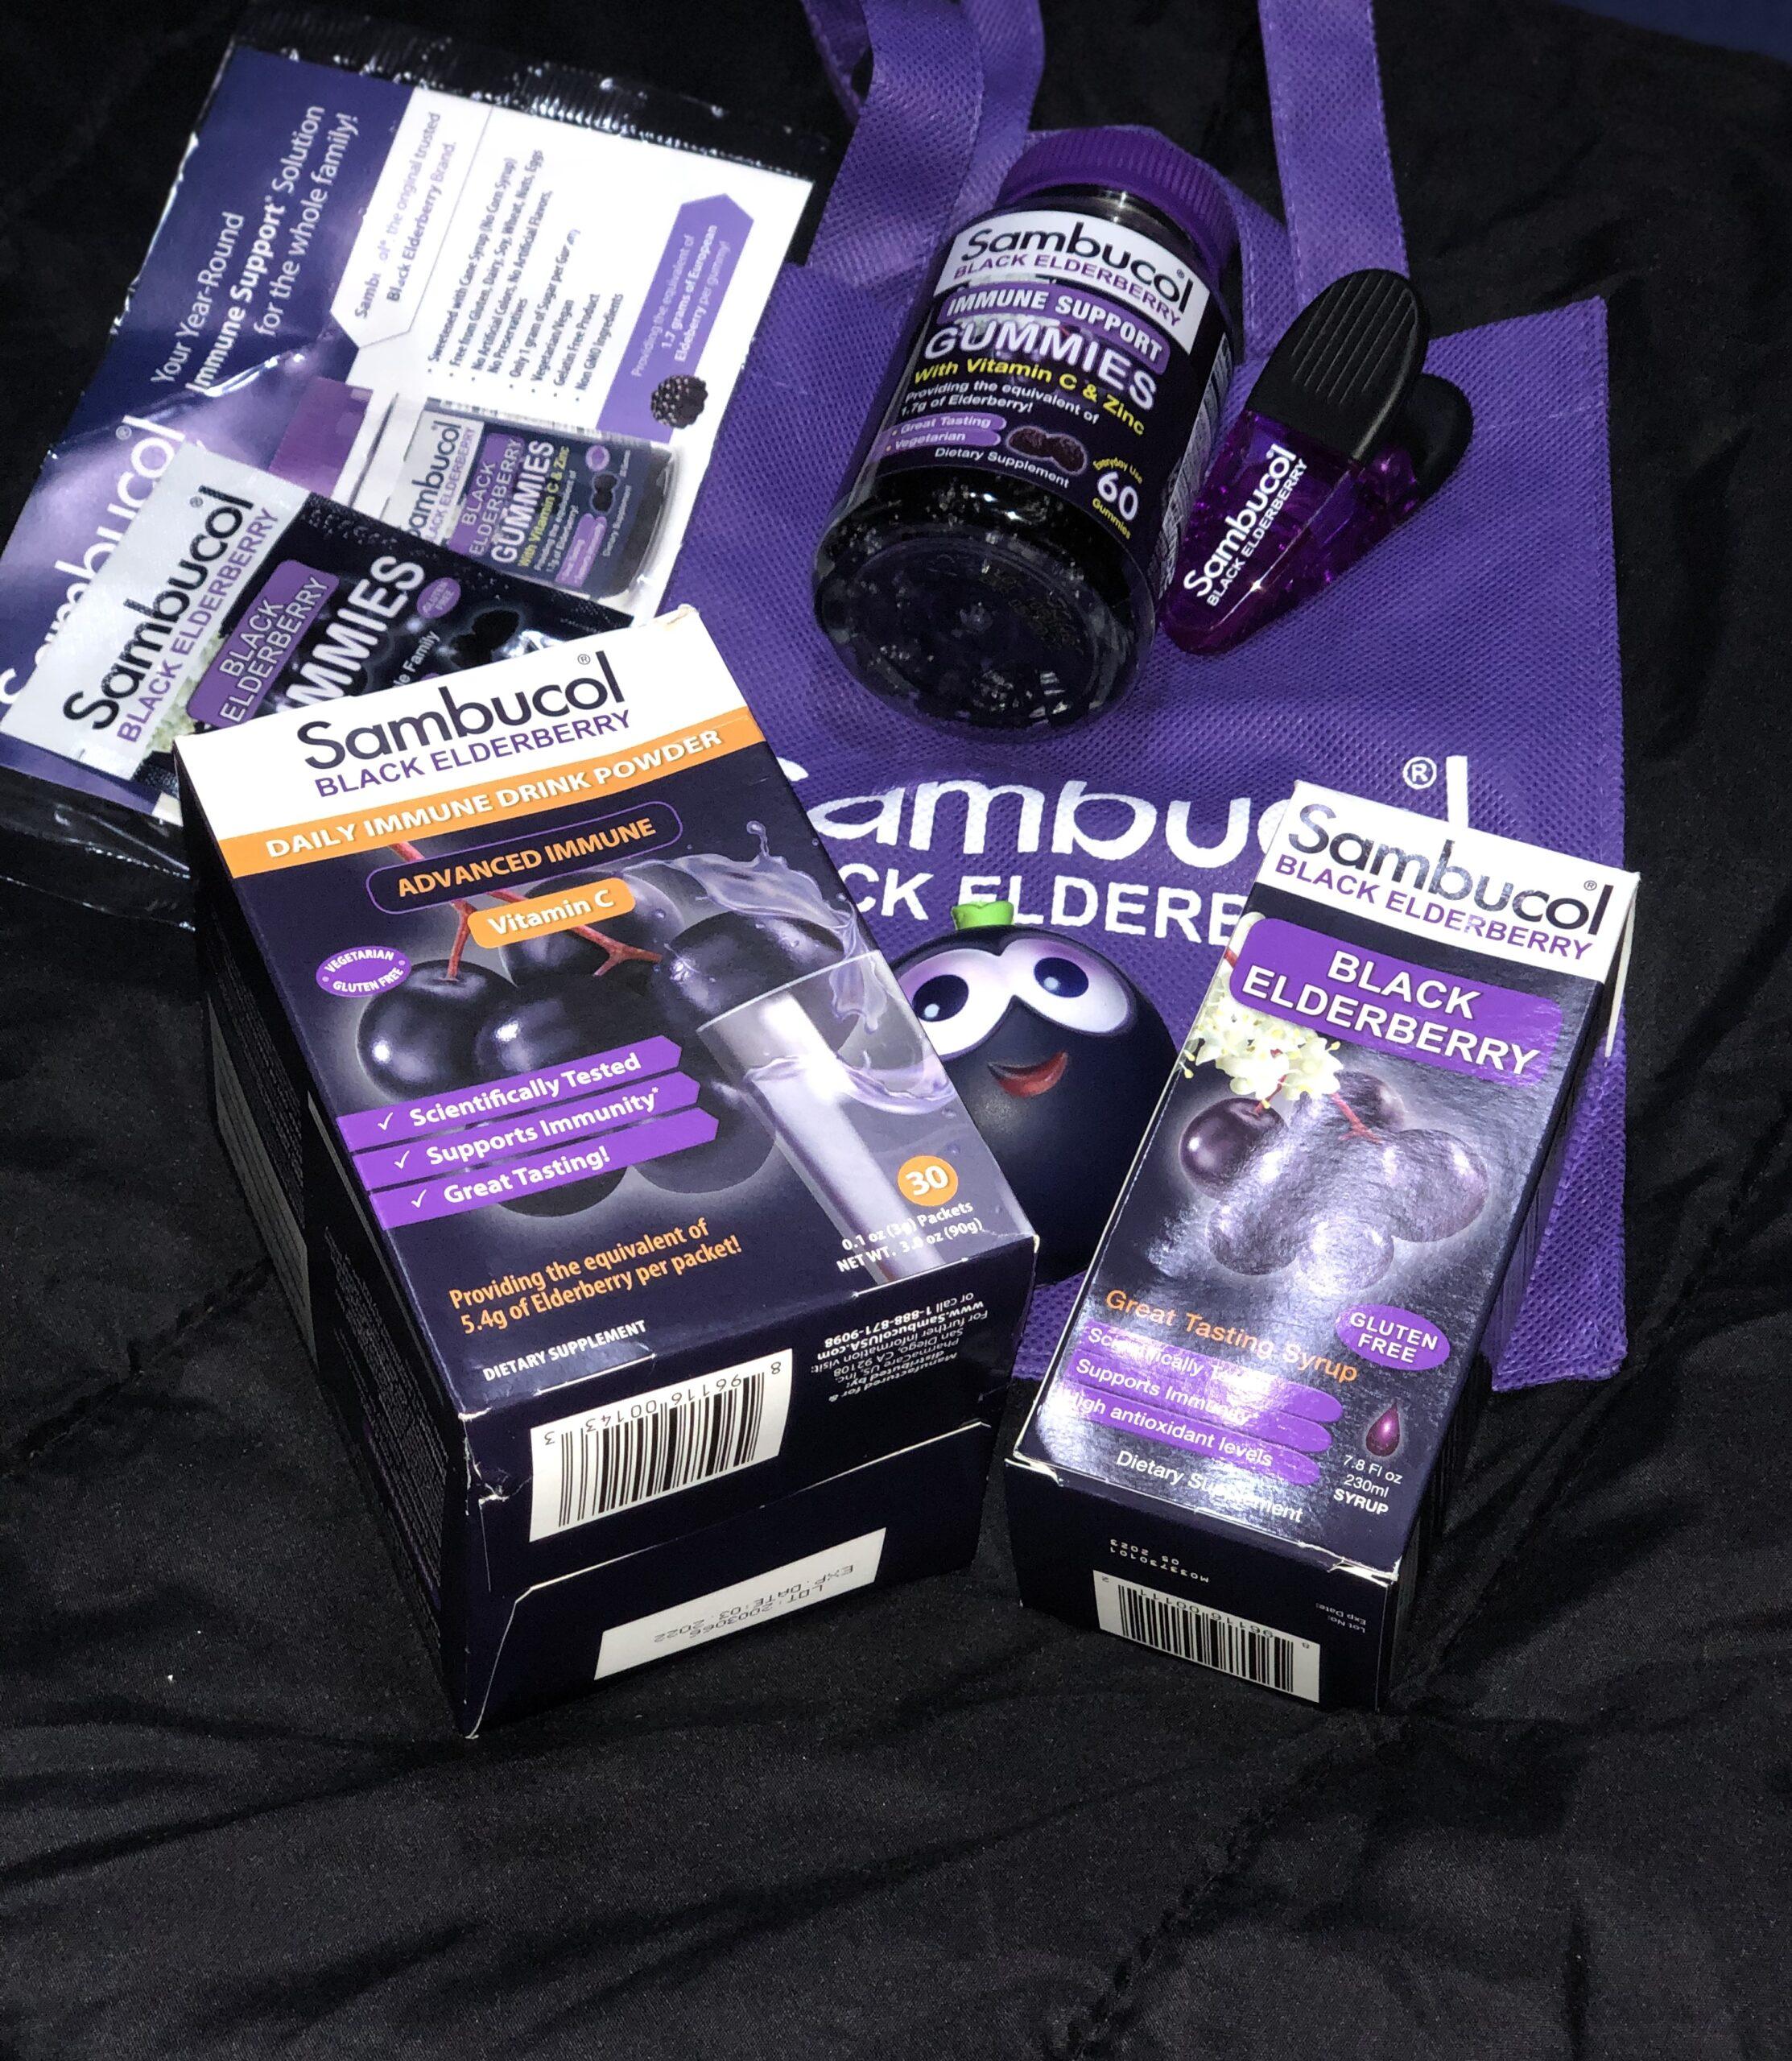 Sambucol Black Elderberry Review #Elderberry #Sambucol #LetsSambucol